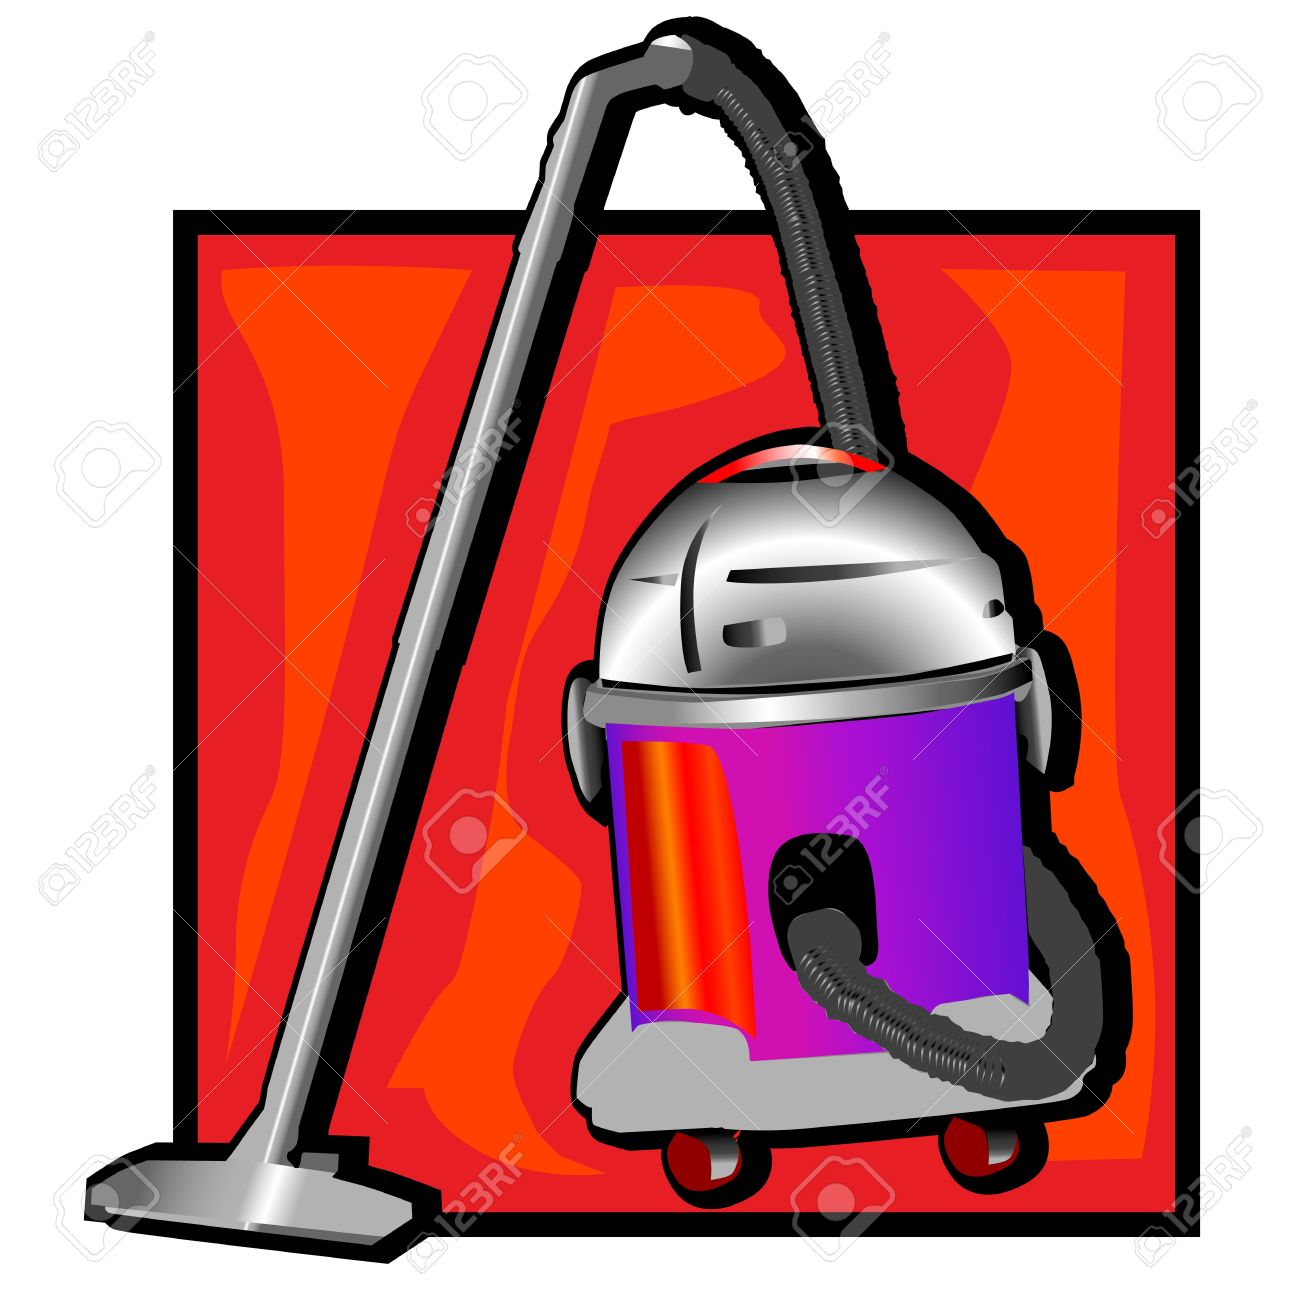 Vacuum pictures clipart clip art black and white library Vacuum Clip Art Free | Clipart Panda - Free Clipart Images clip art black and white library